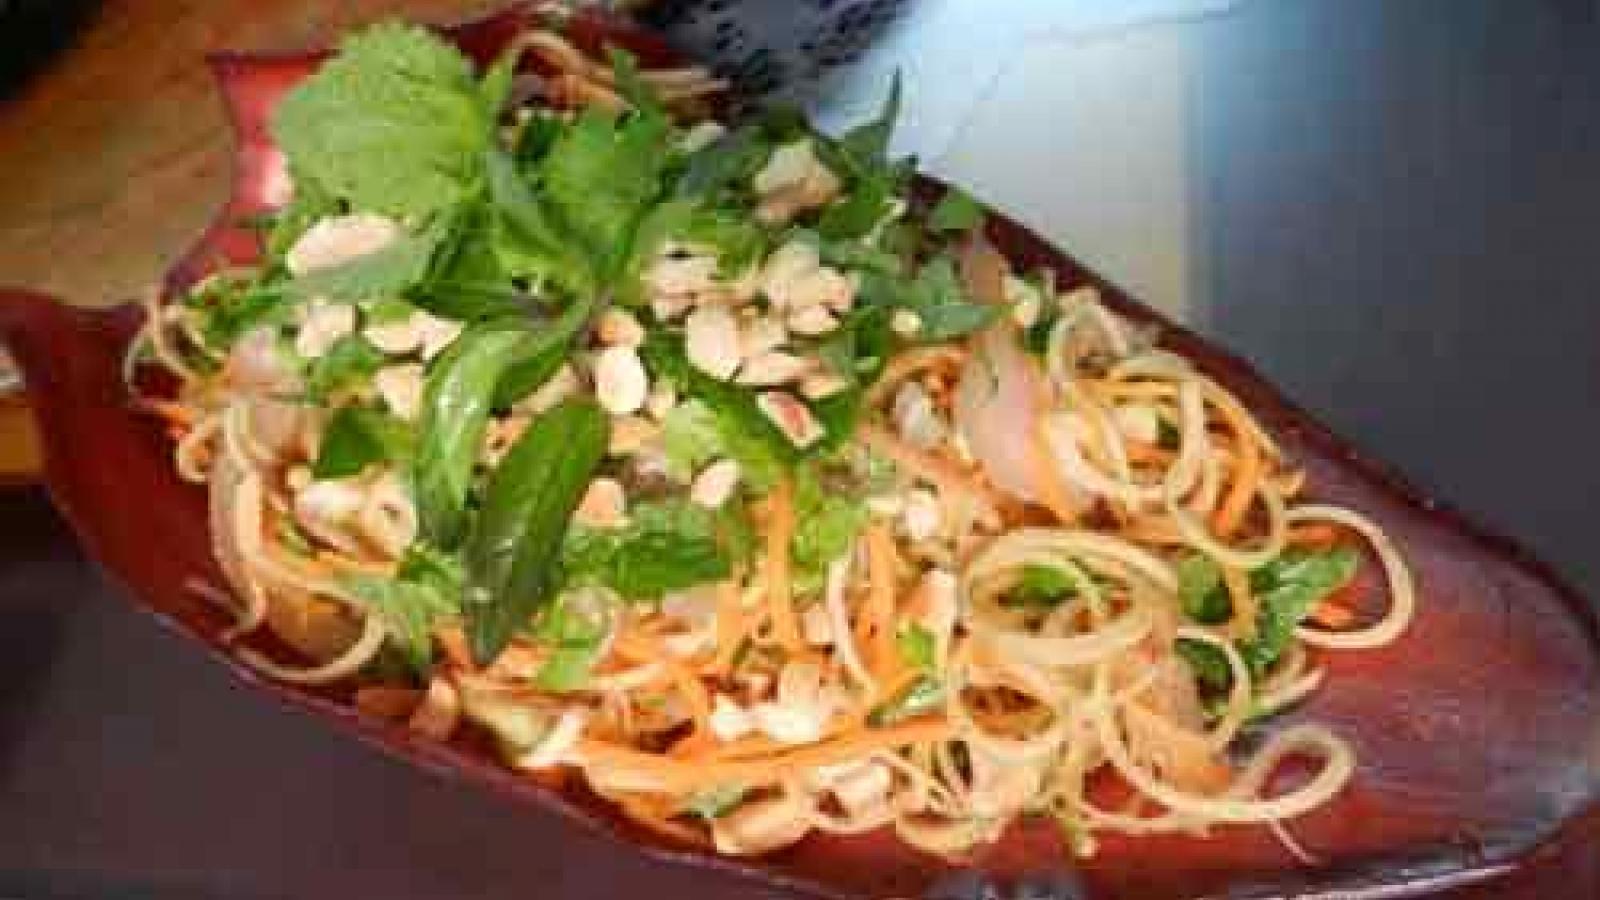 Banana blossom salad – a specialty of Vietnam cuisine